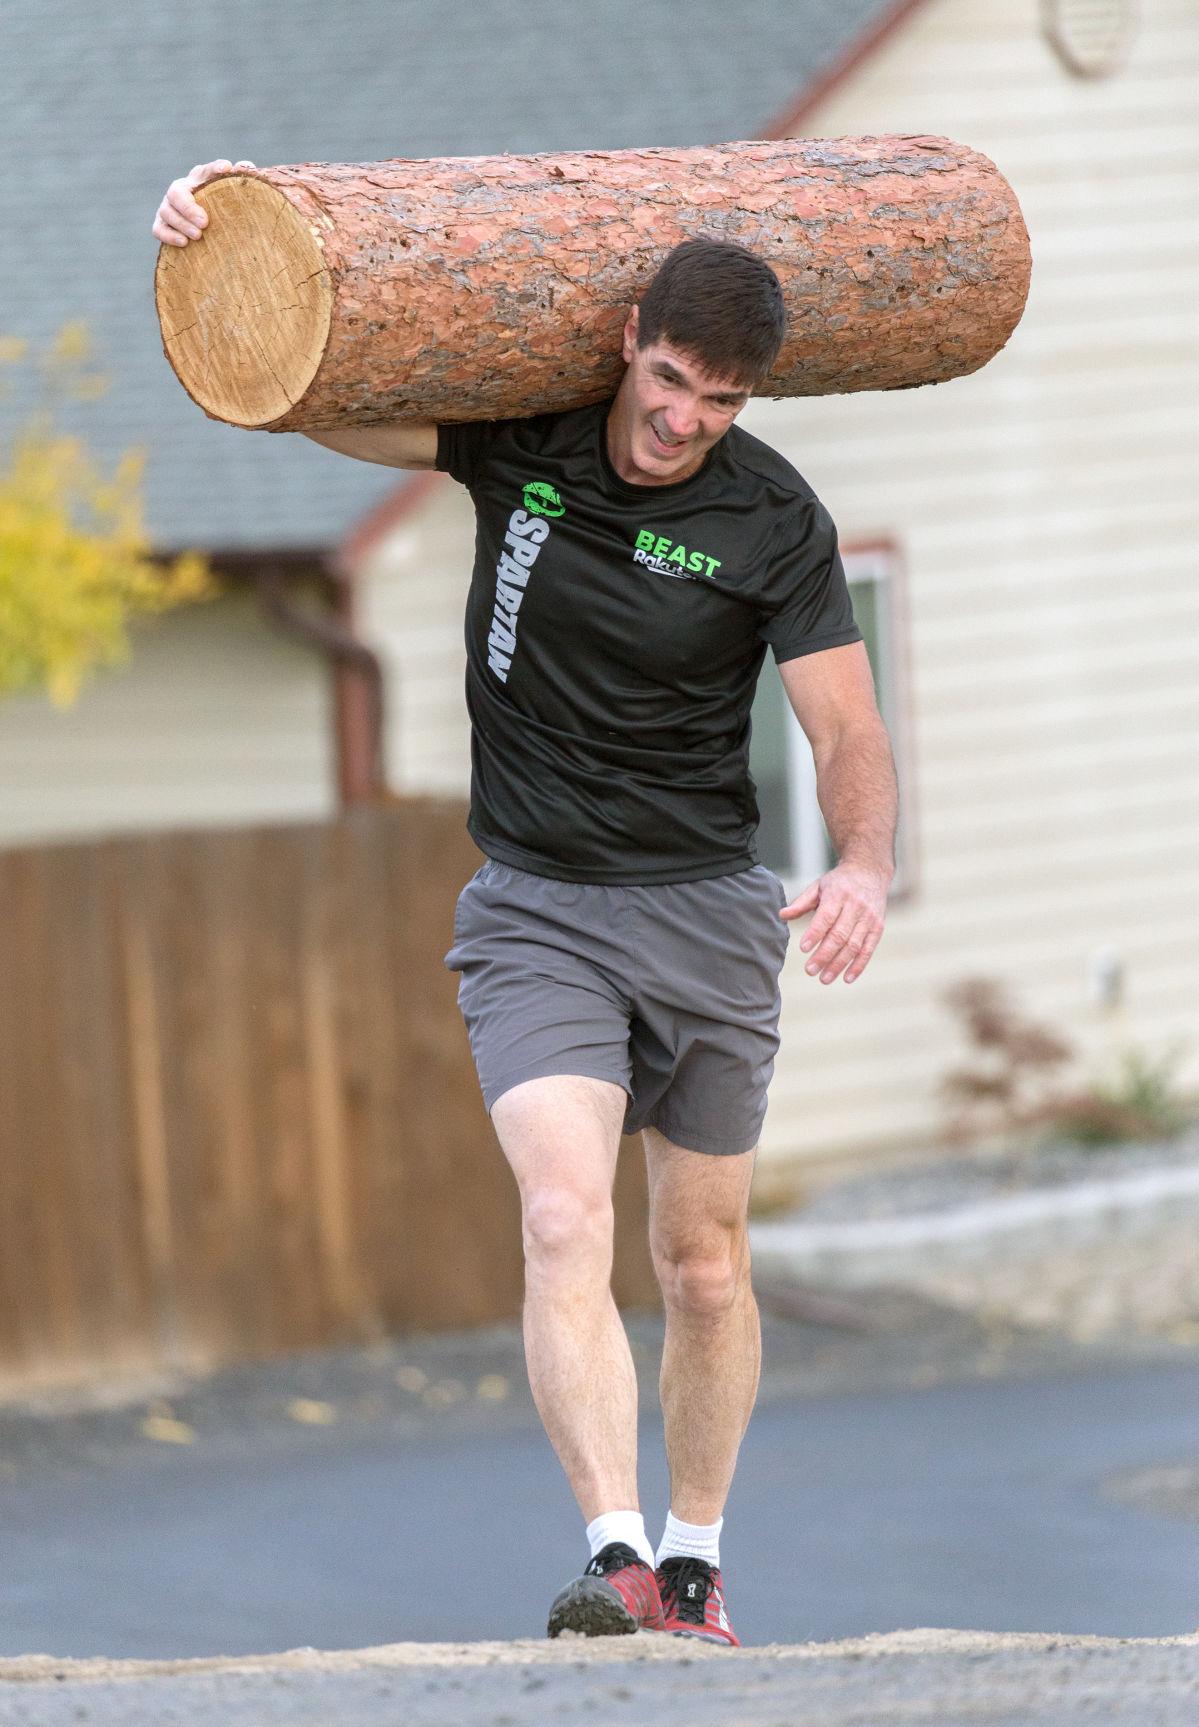 Spartan Race guy